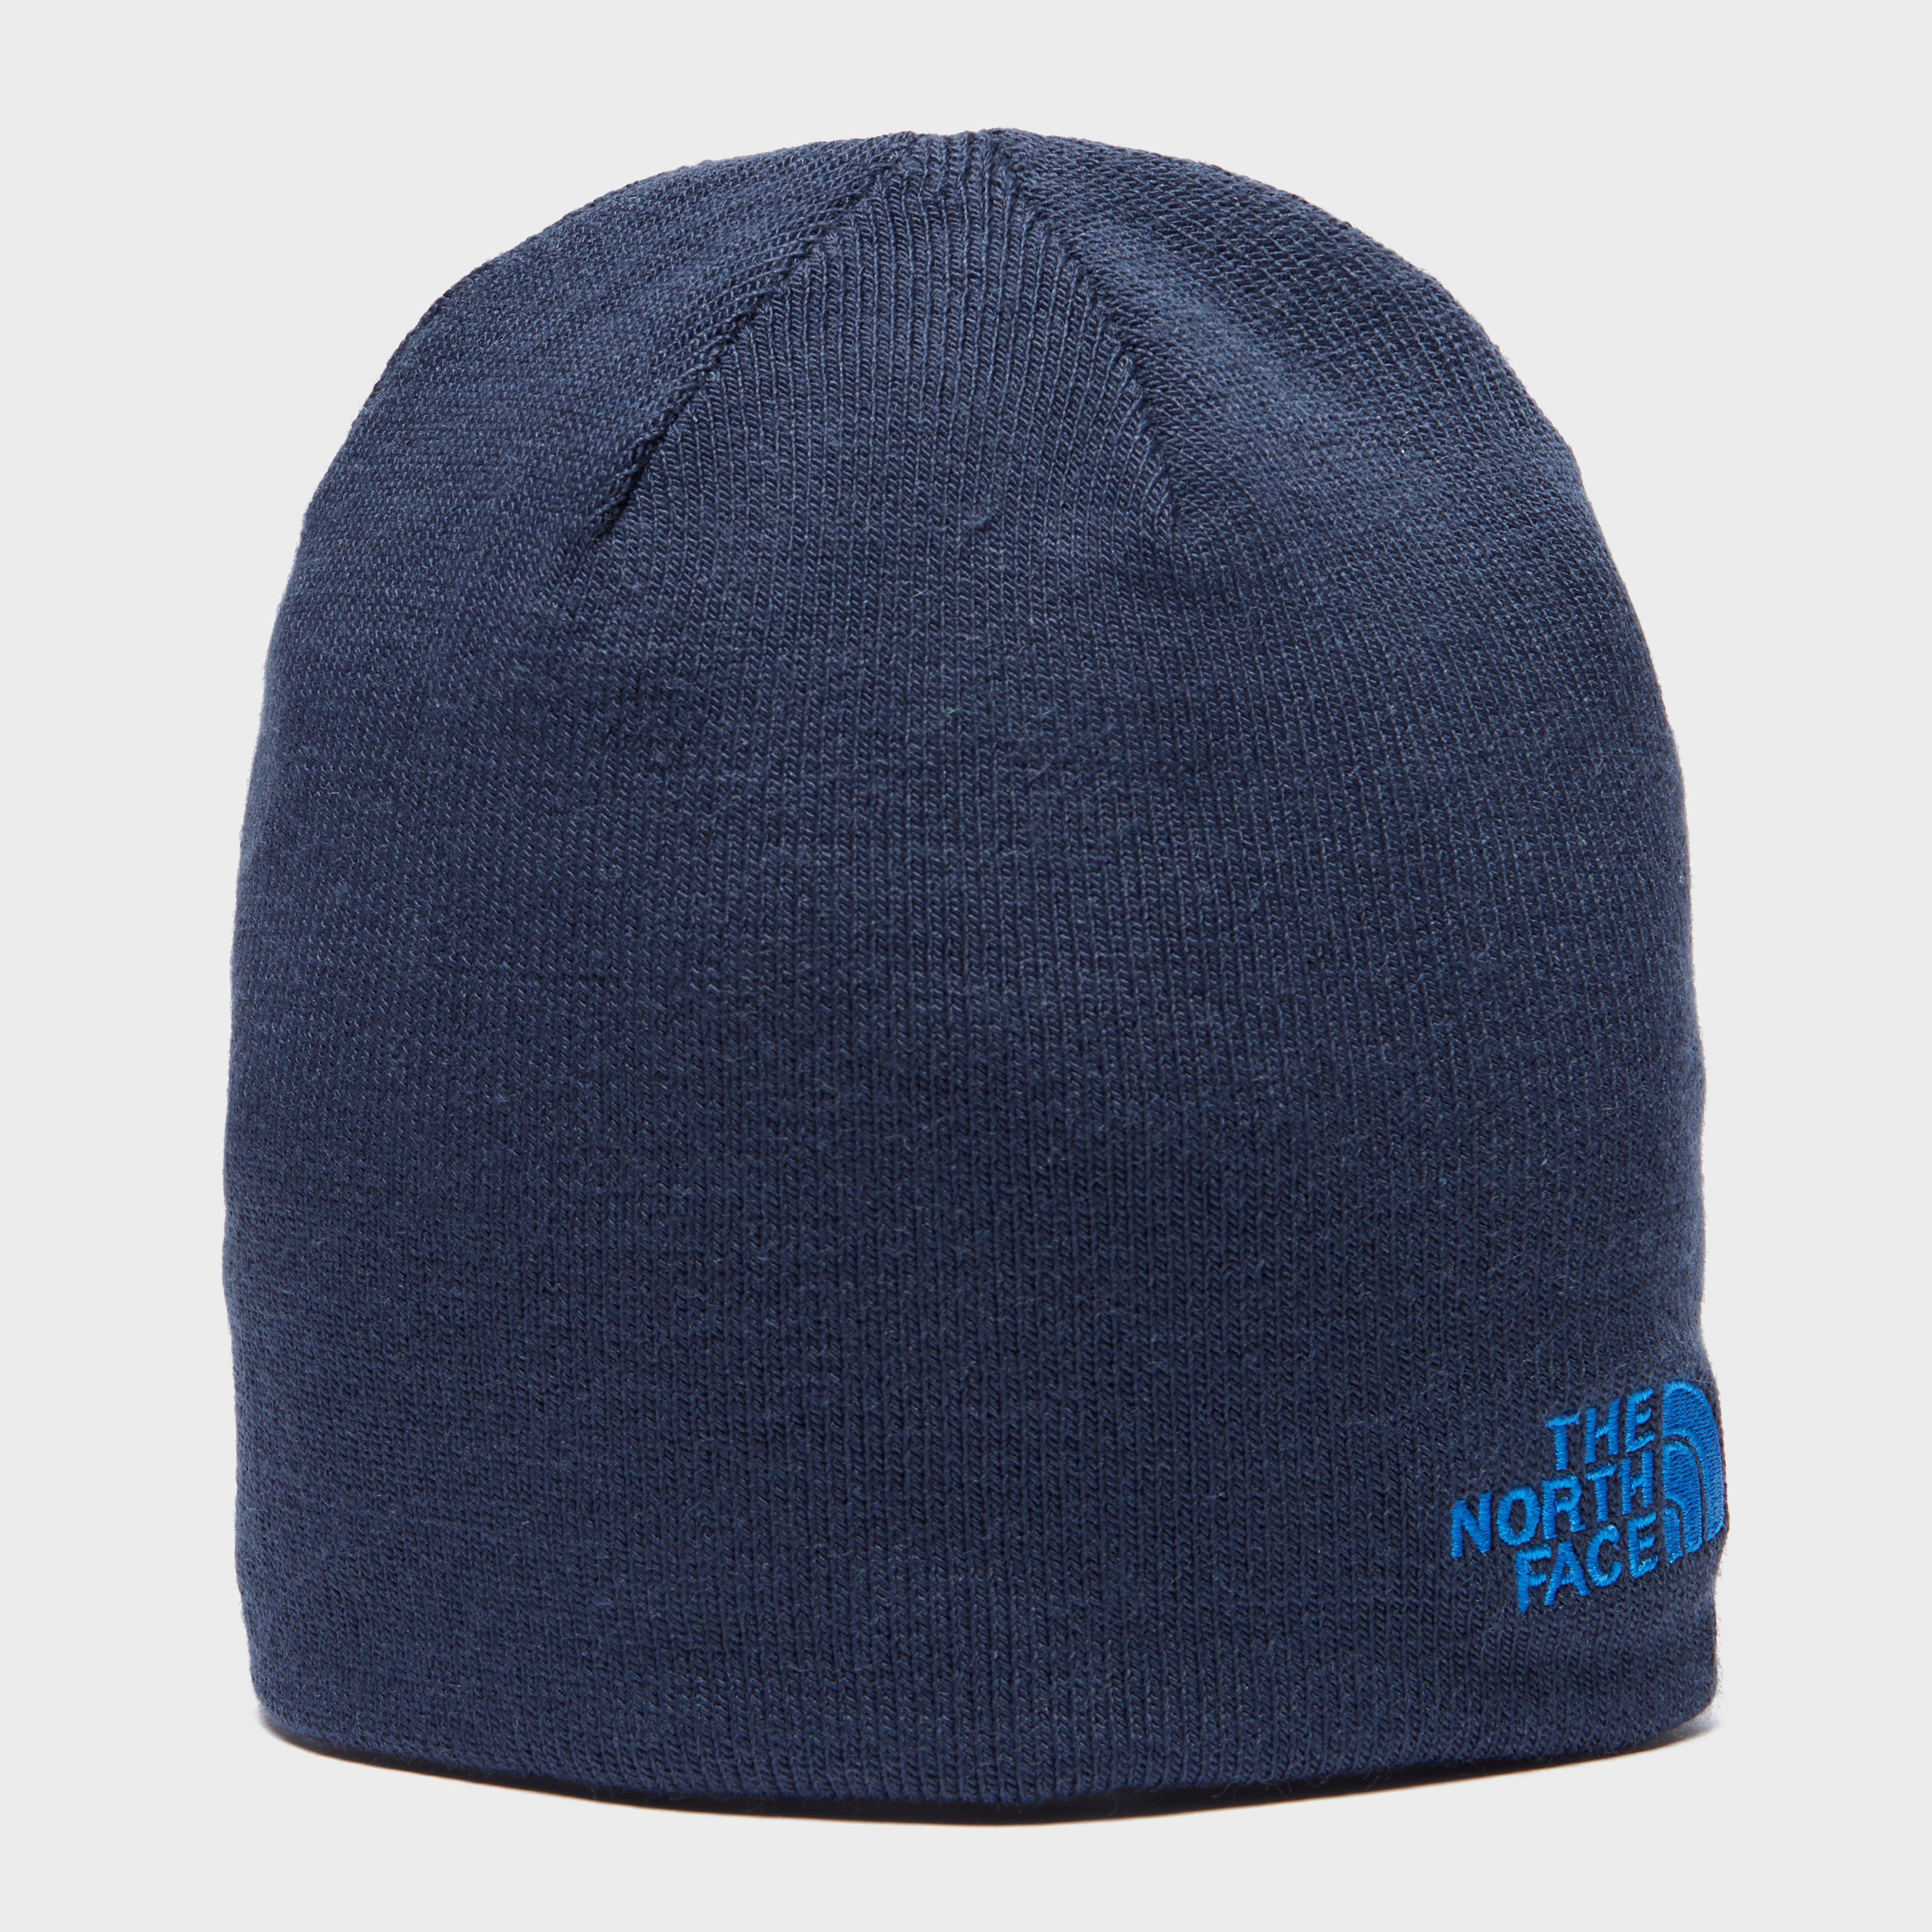 THE NORTH FACE Men's Gateway Beanie Hat